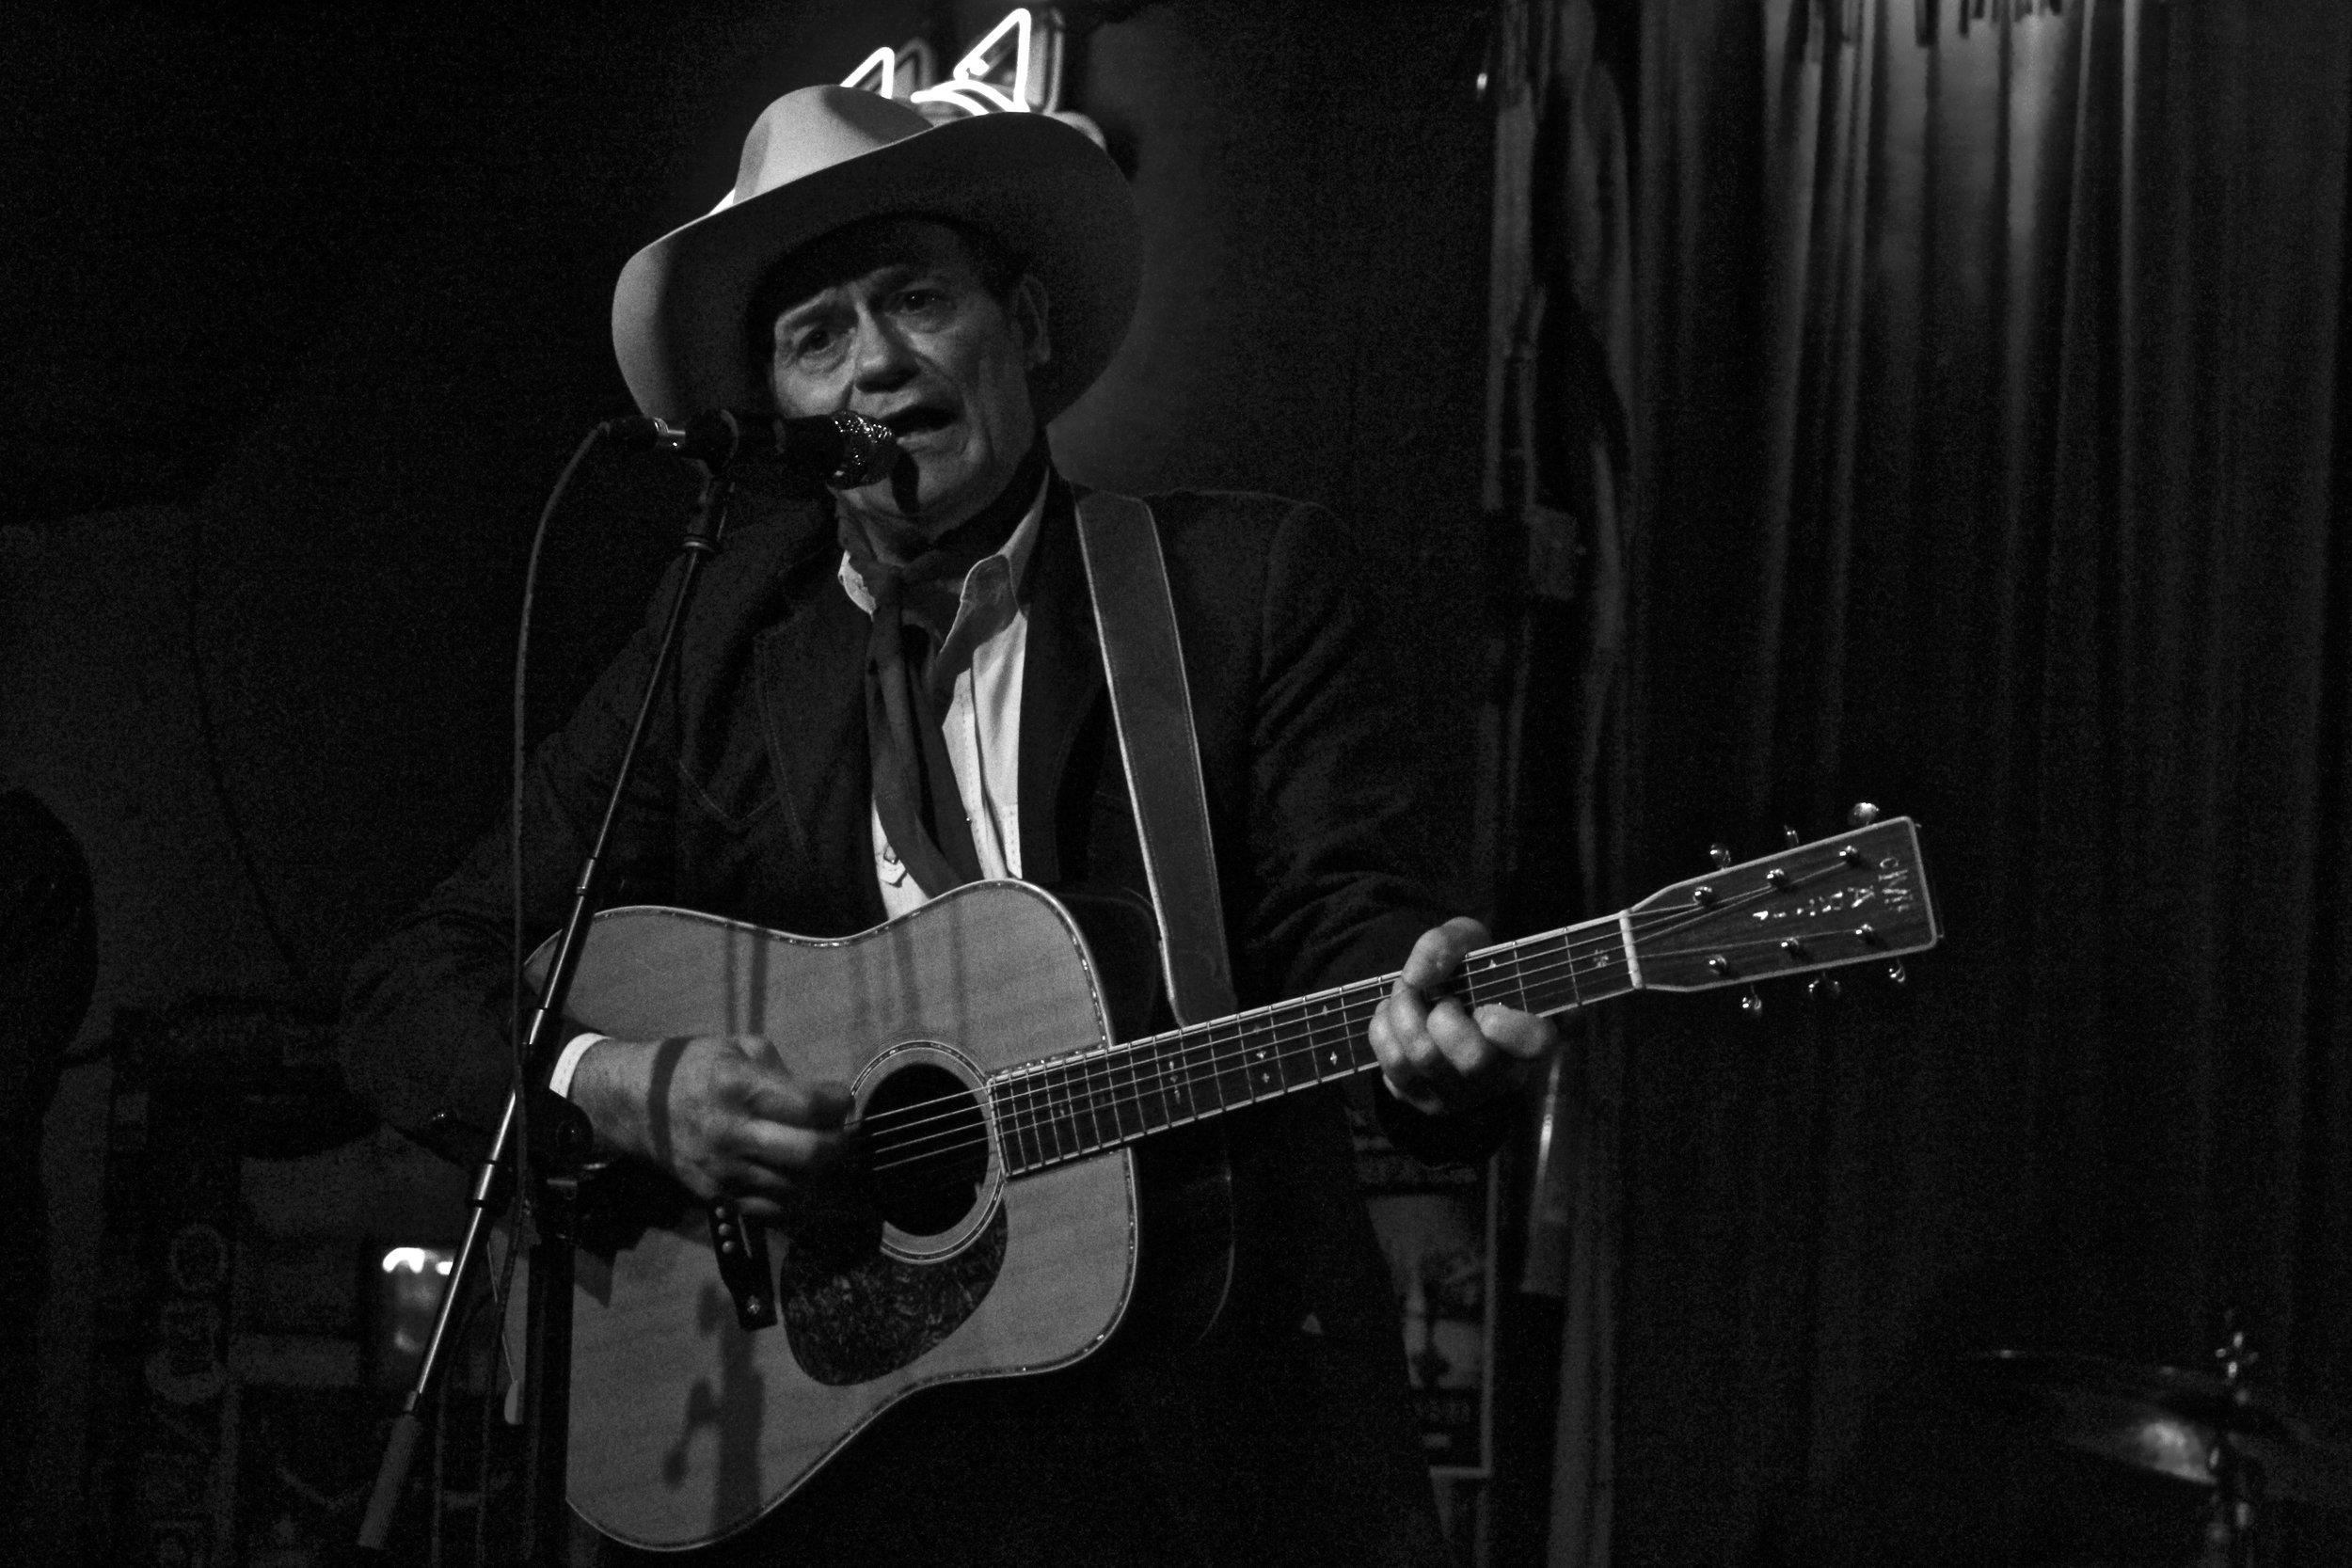 James Hand. Austin, TX. March 2016.